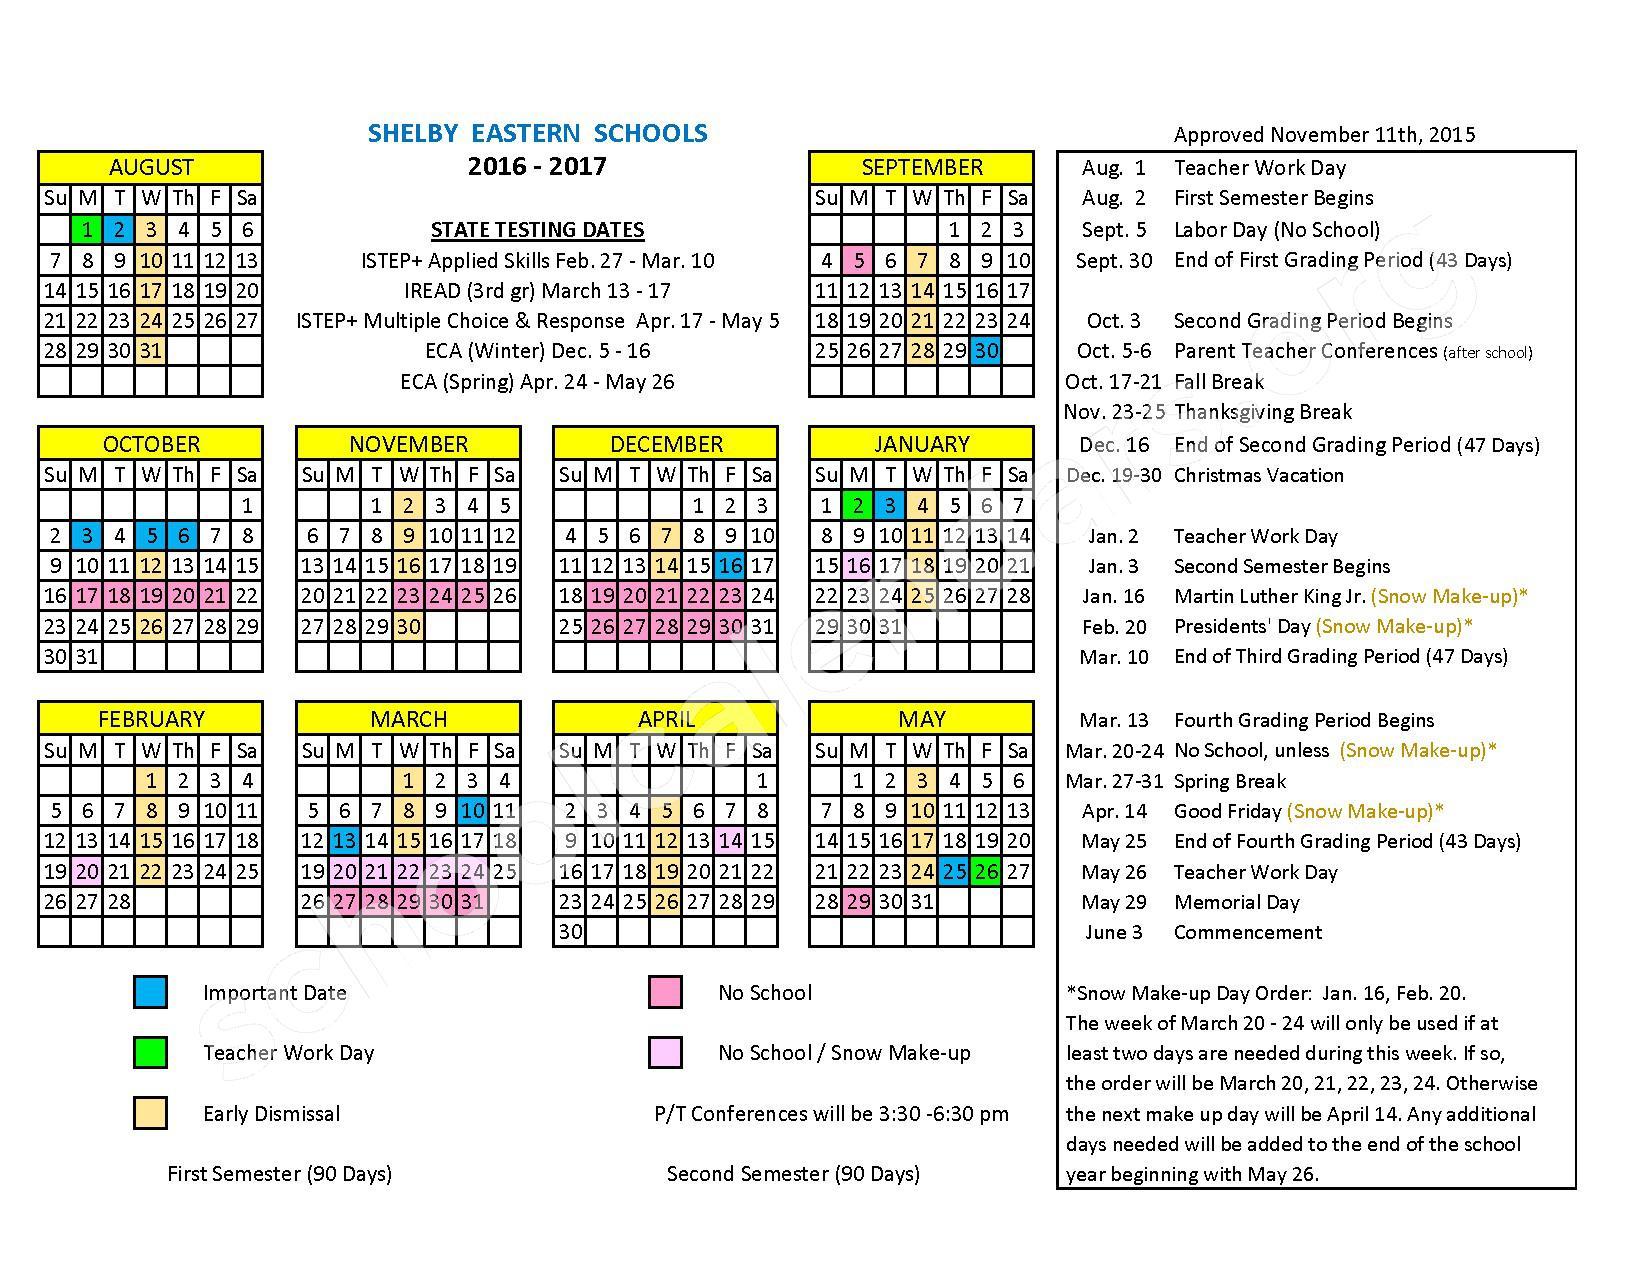 2016 - 2017 School Calendar – Shelby Eastern Schools – page 1